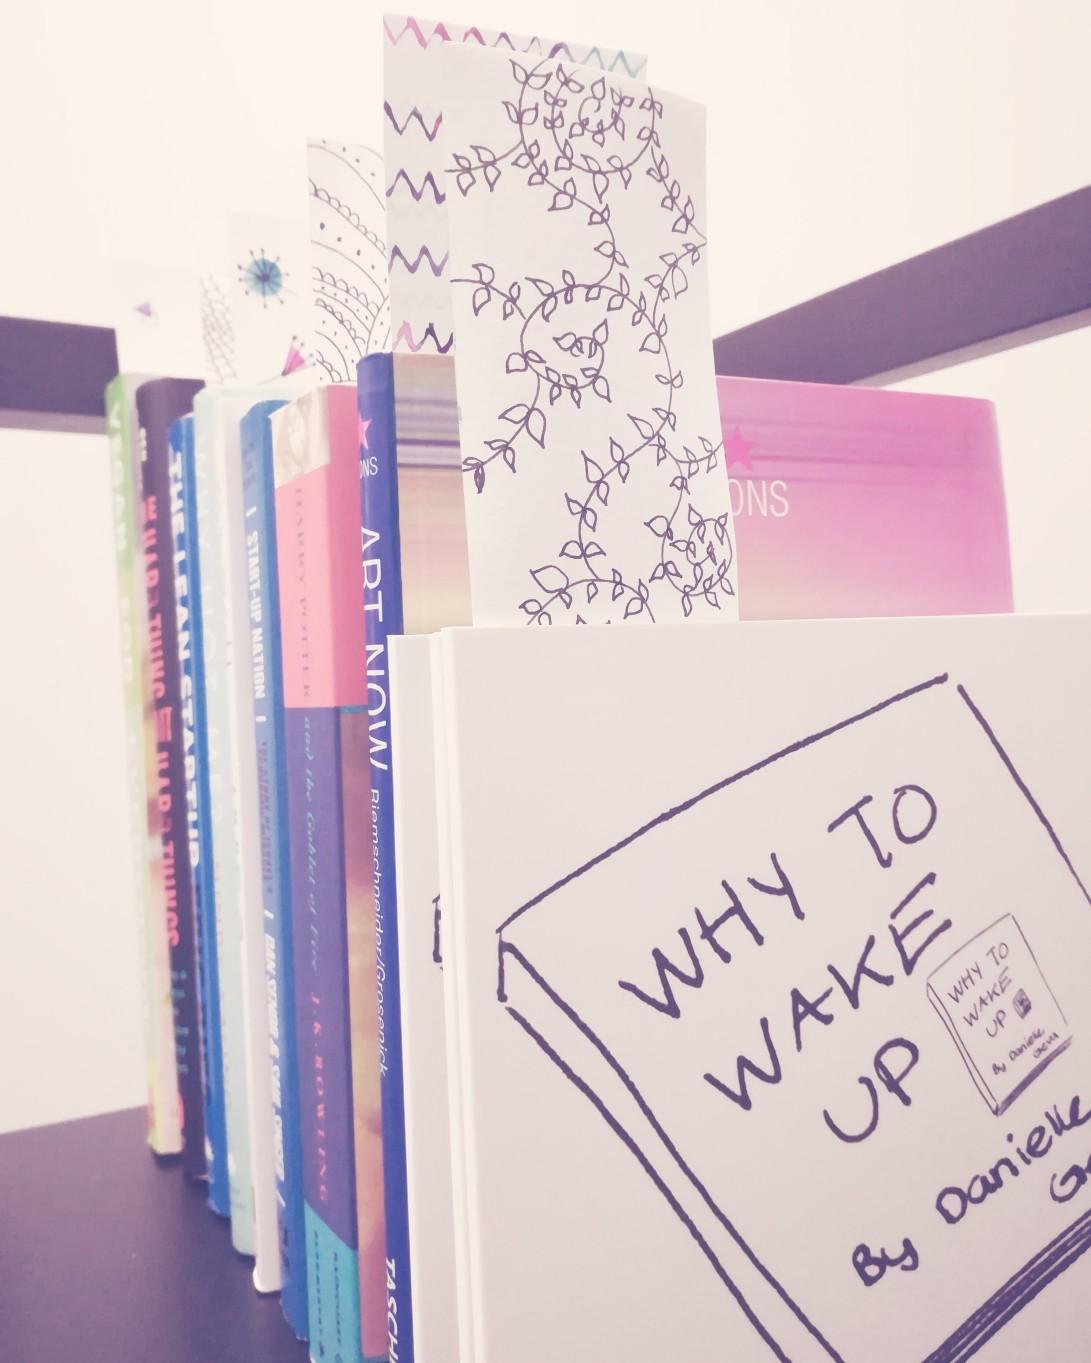 Why to Wake Up Bookmarks Art Danielle Geva